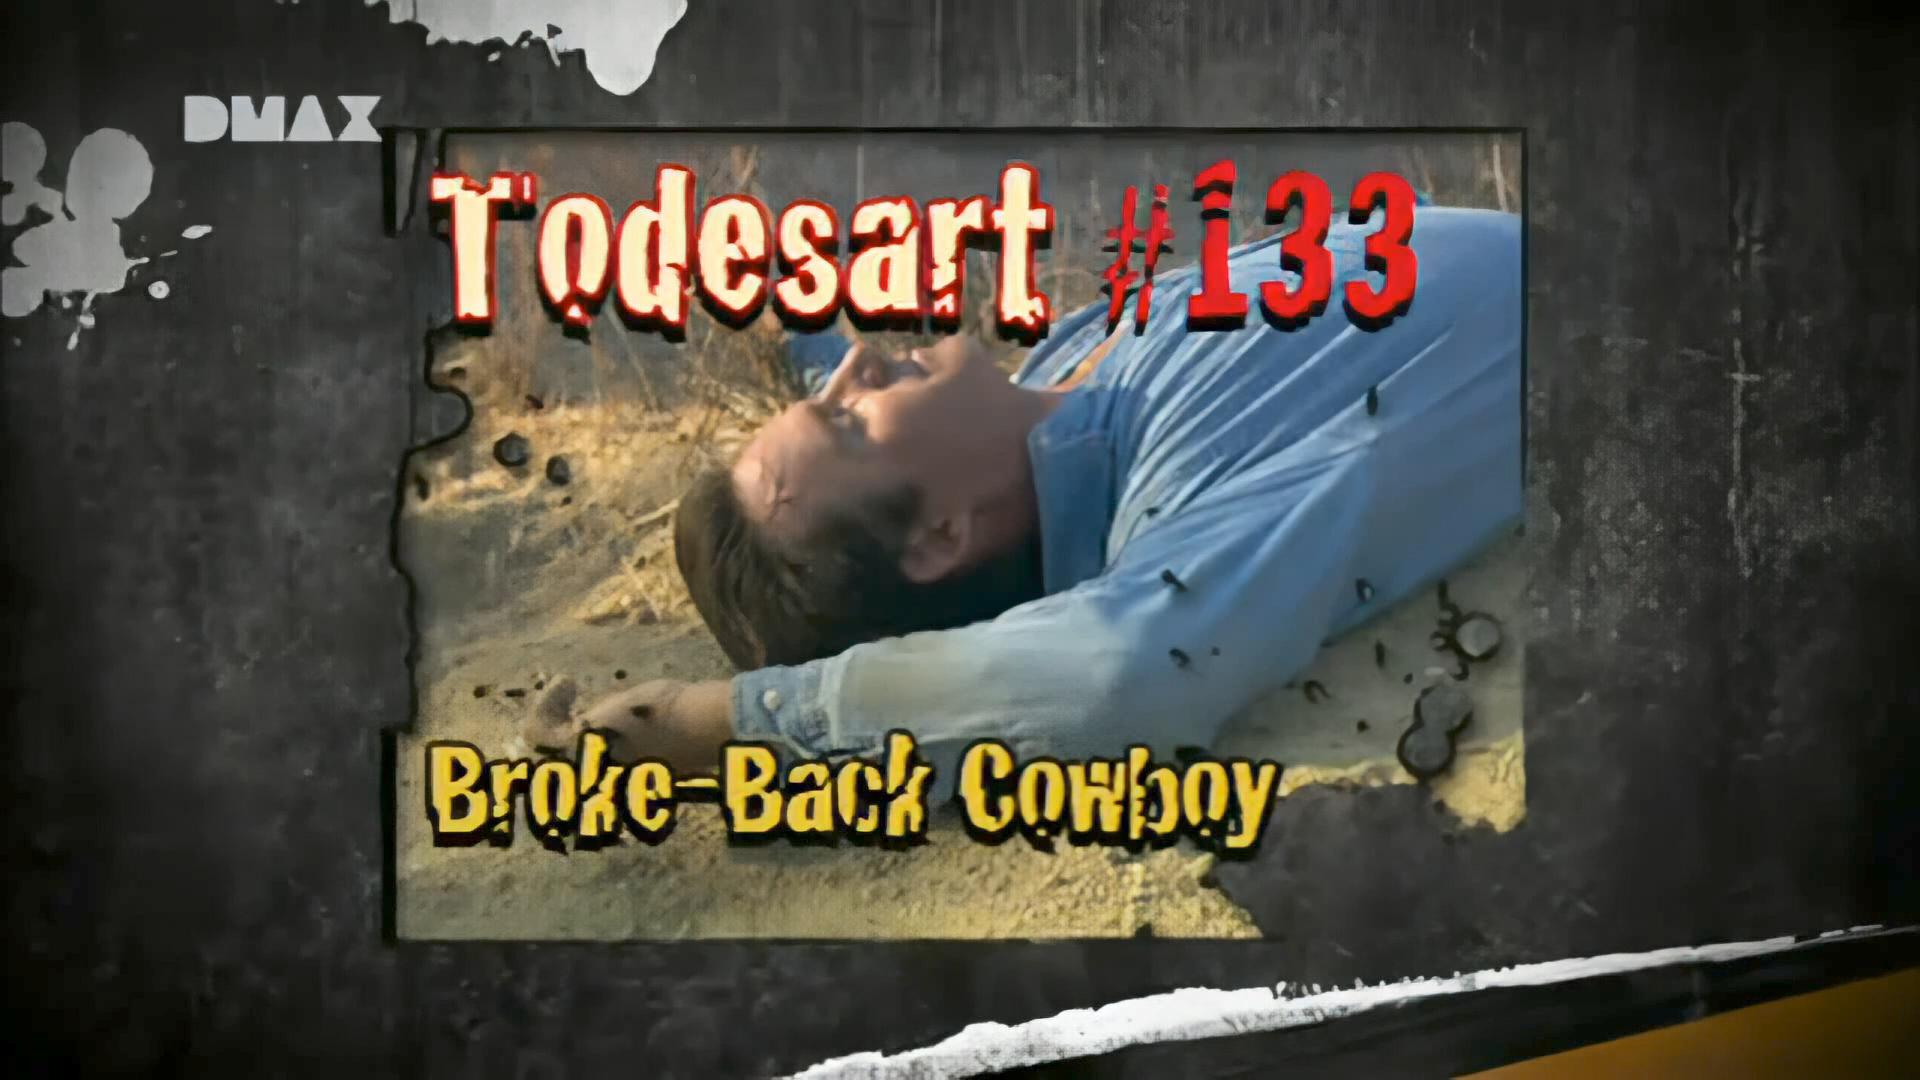 Broke-Back Cowboy